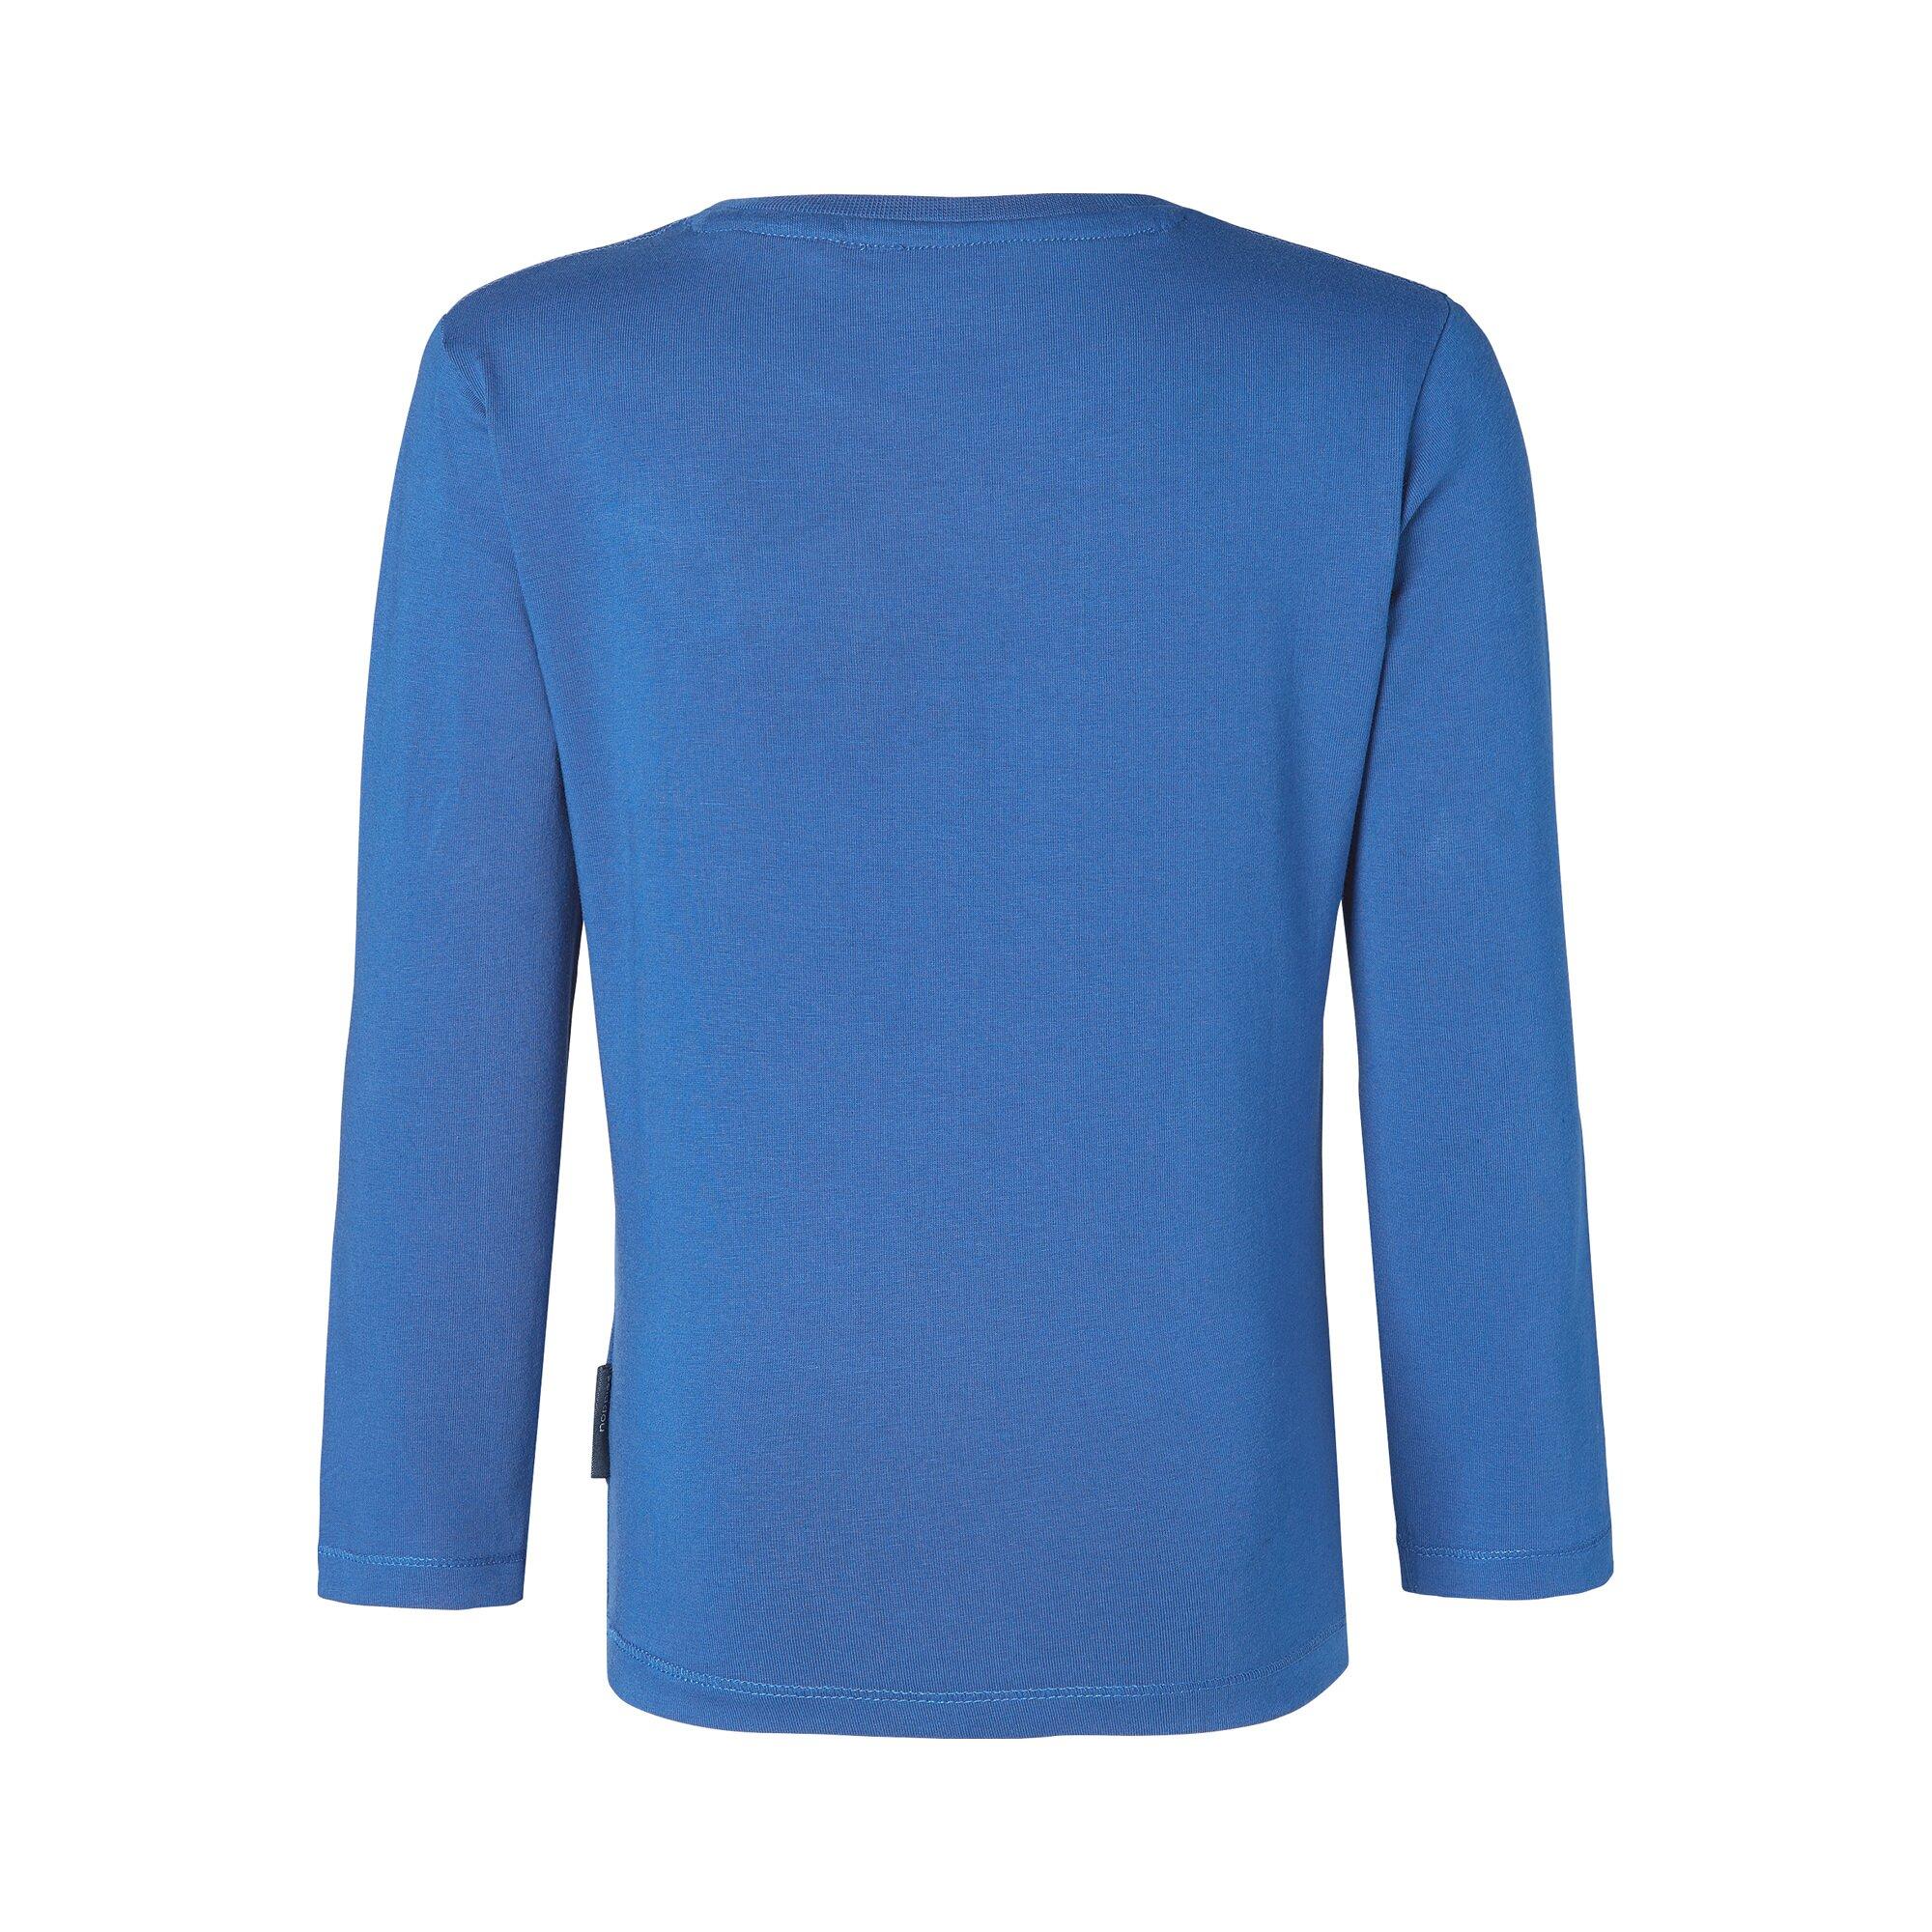 noppies-shirt-langarm-camaleon-kanzaki